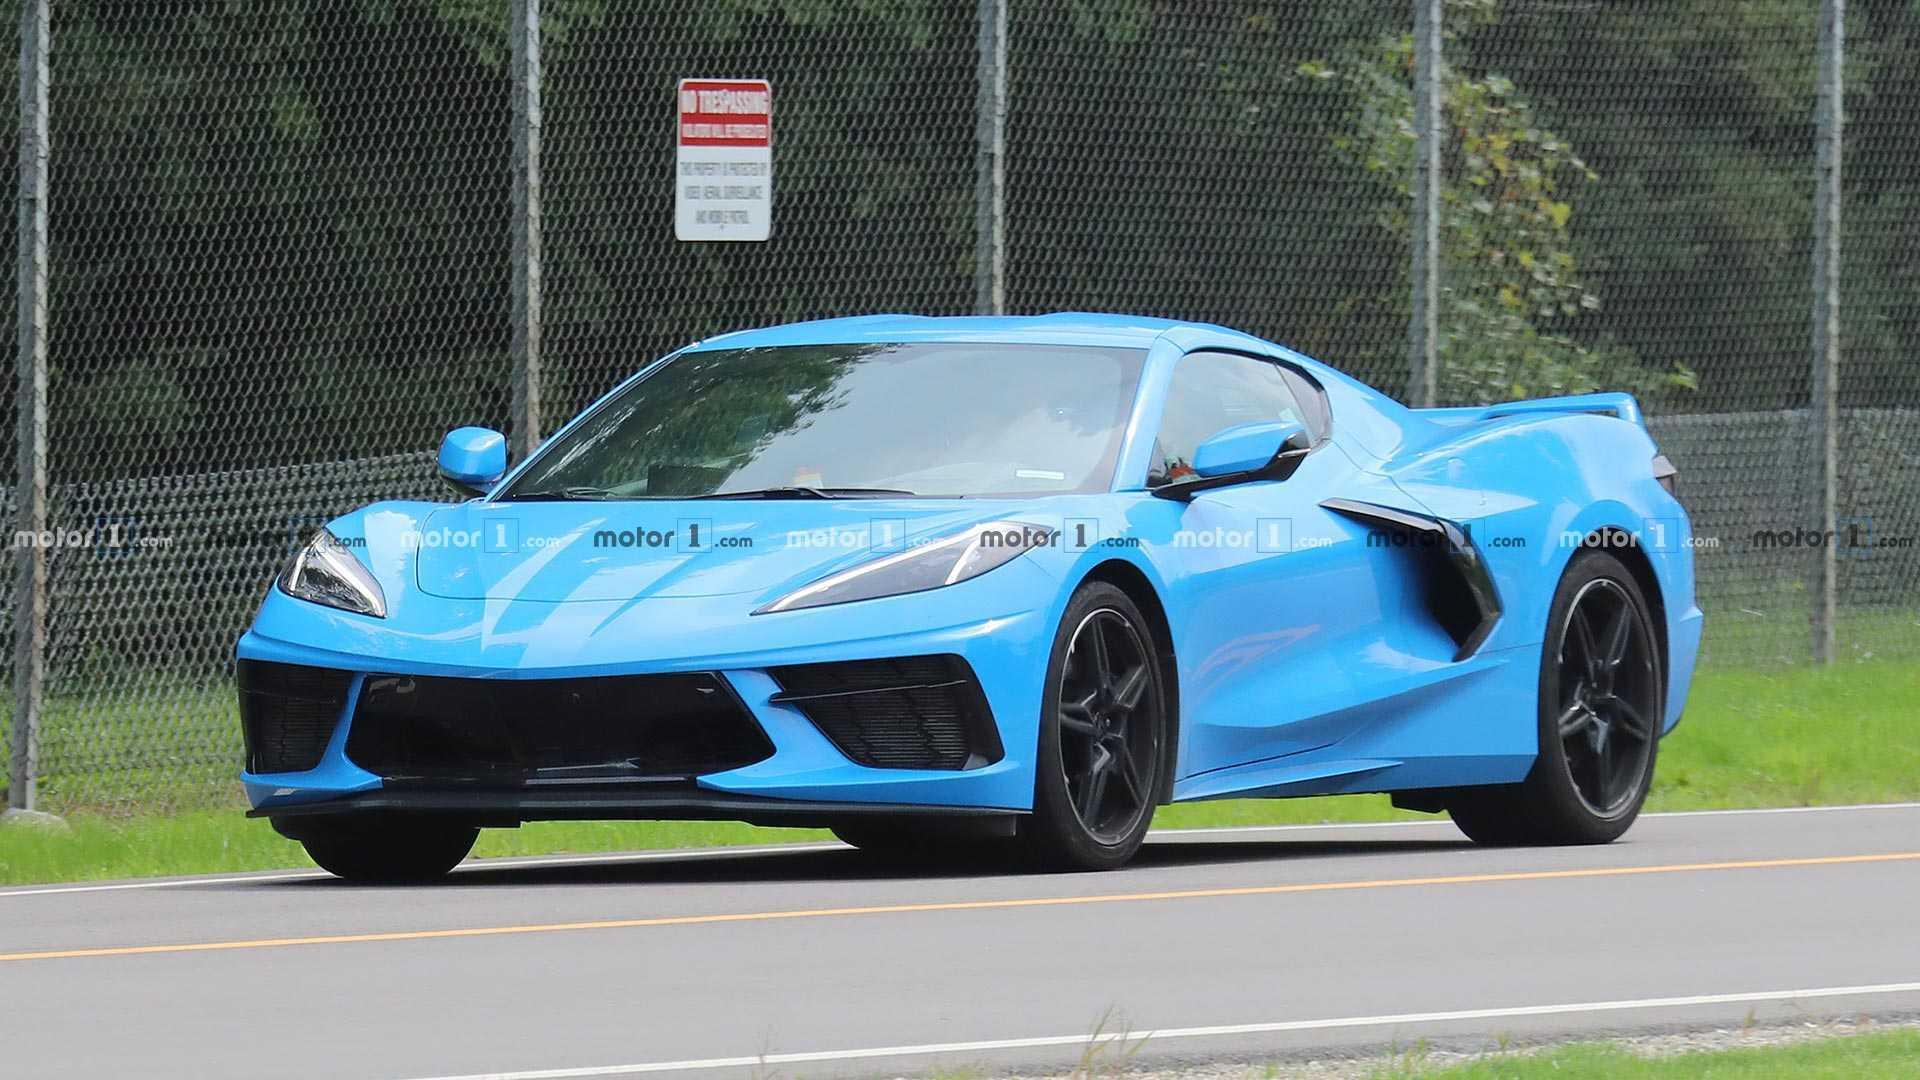 2020 Corvette Spied In Rapid Blue Better Watch Out For Gargamel